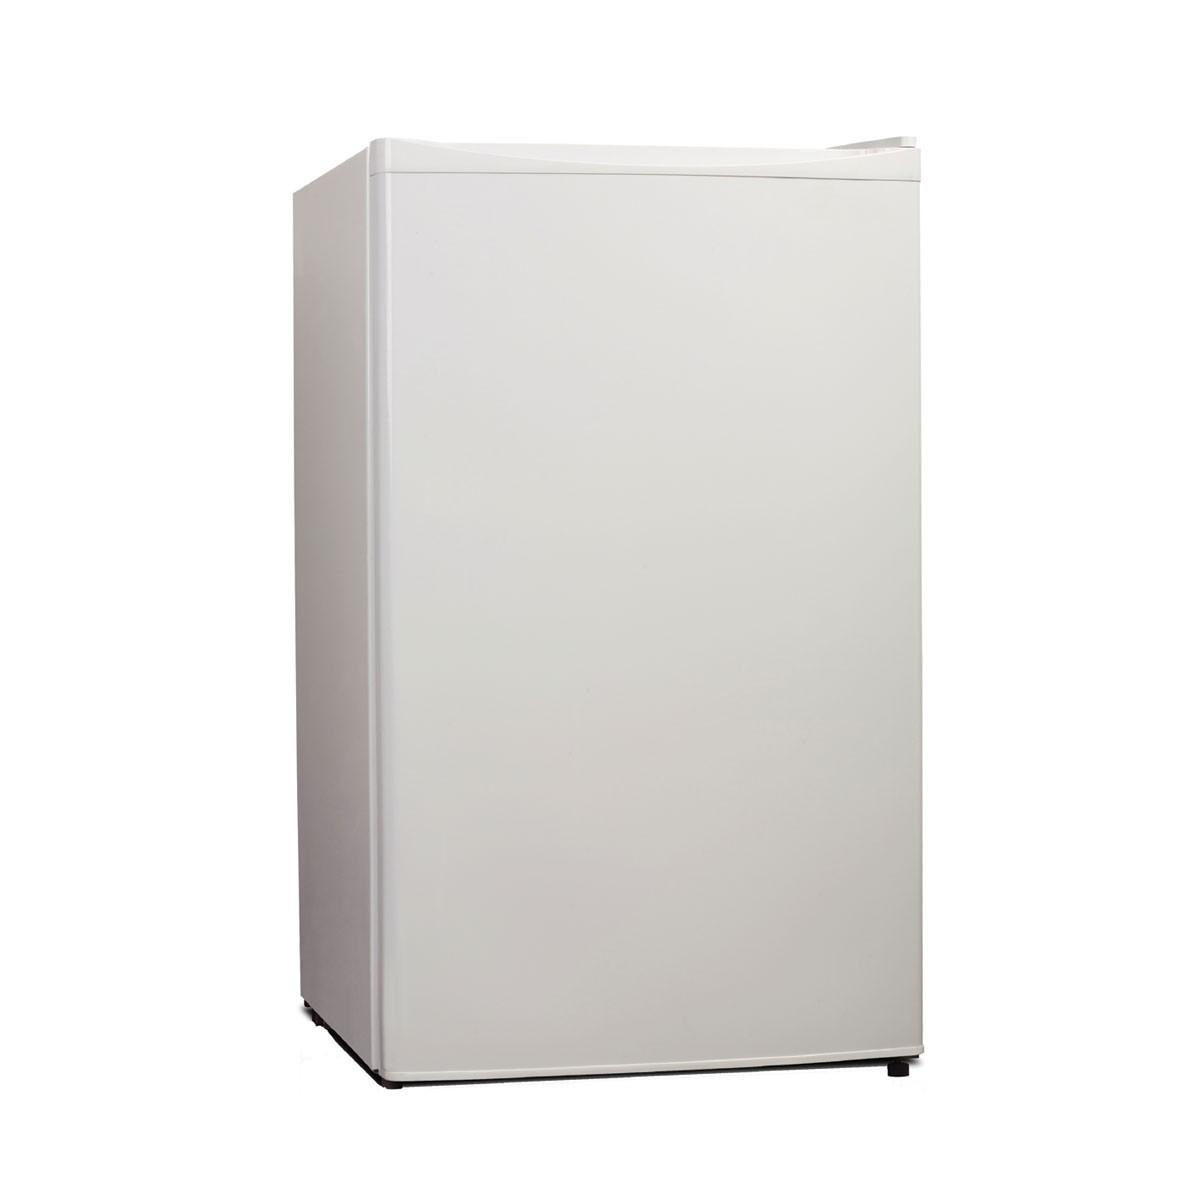 Cheap One Doors Fridges Freezers